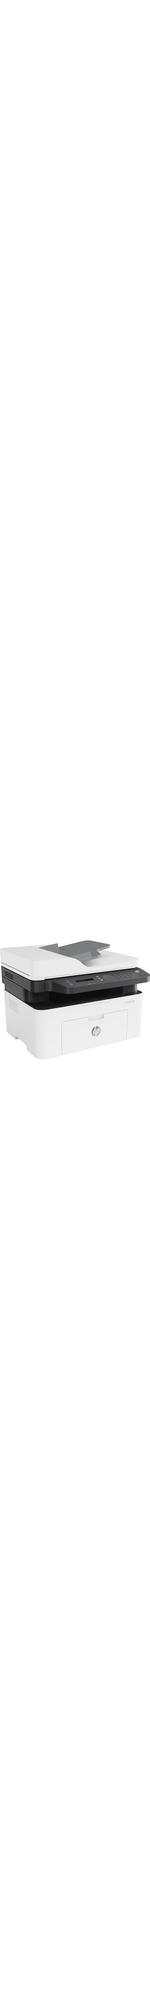 HP 137fnw Laser Multifunction Printer - Monochrome